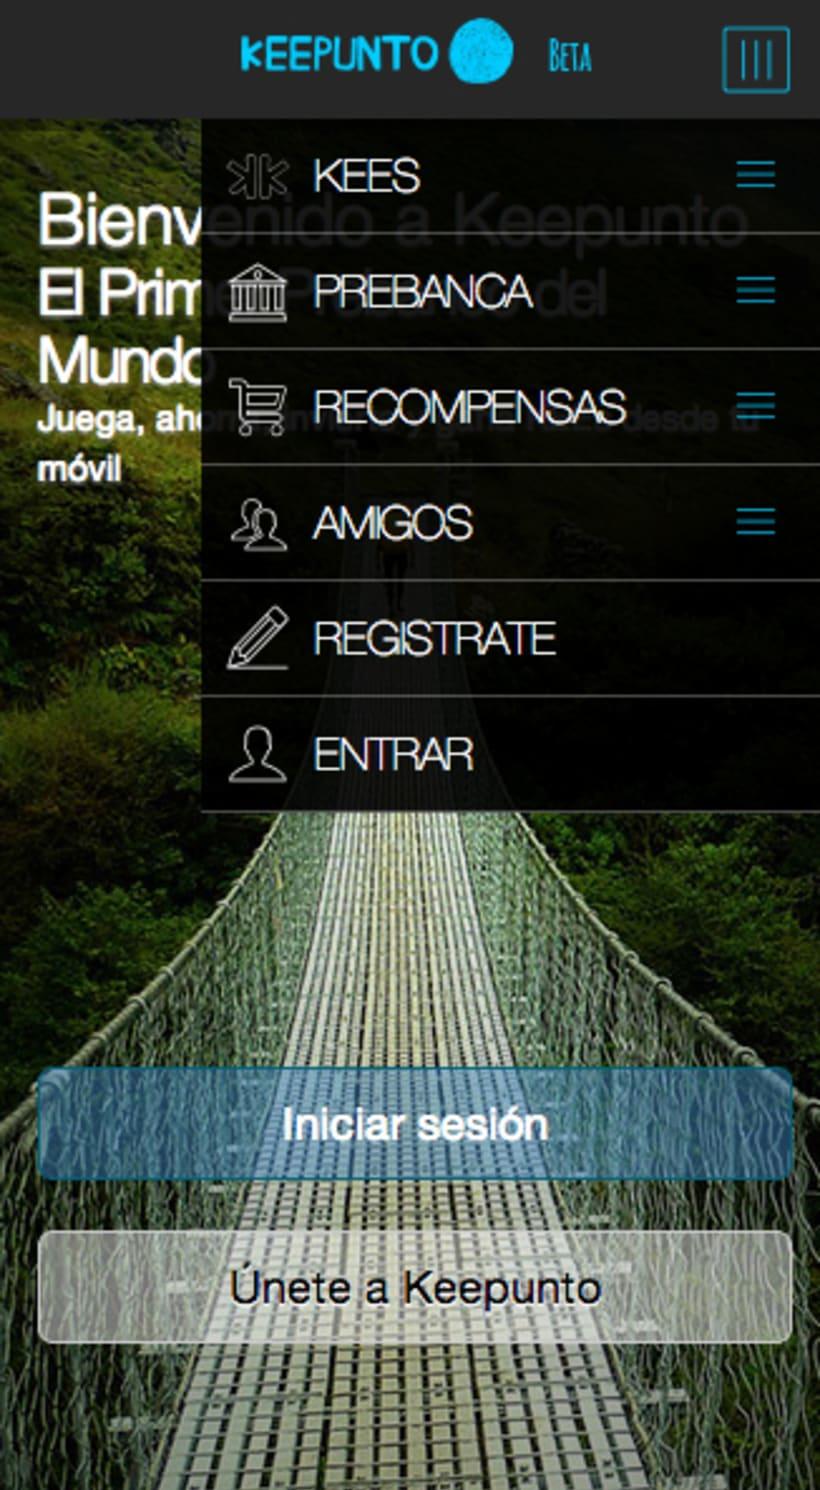 Keepunto Diseño Movil (web mobile) 2